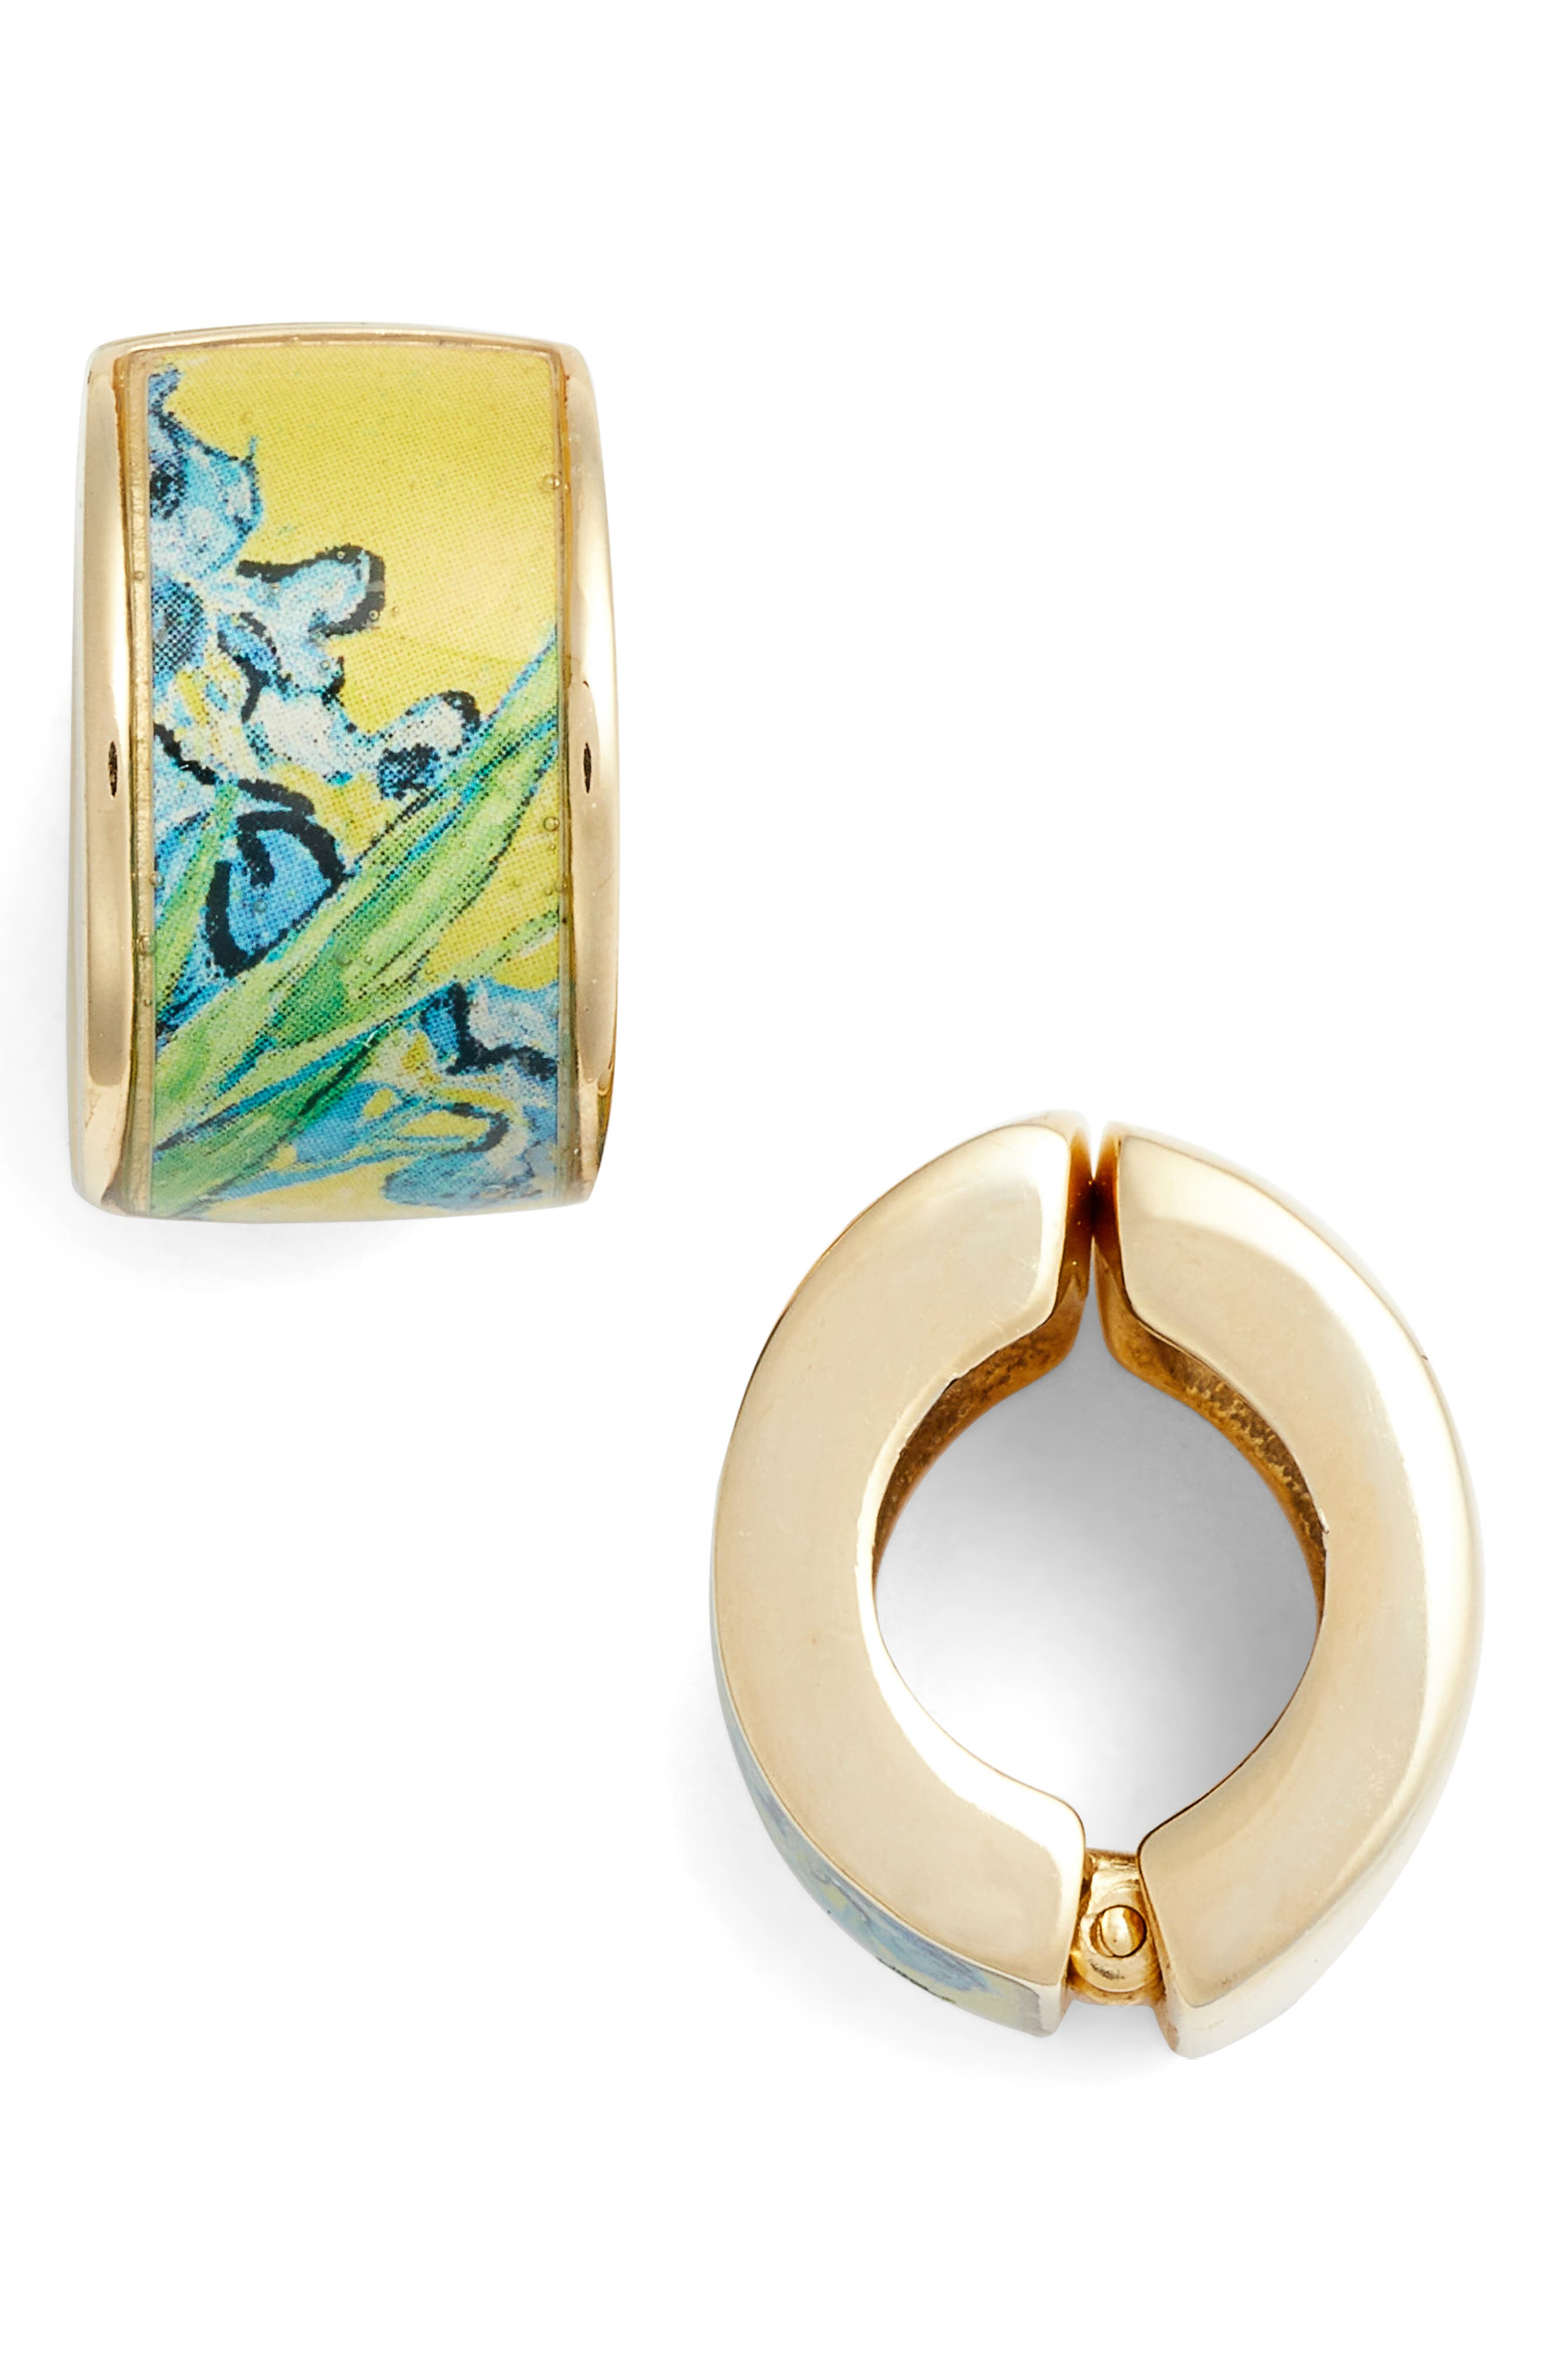 Goldtone Irises Clip-on Earrings,                             Main thumbnail 1, color,                             Yellow/ Gold